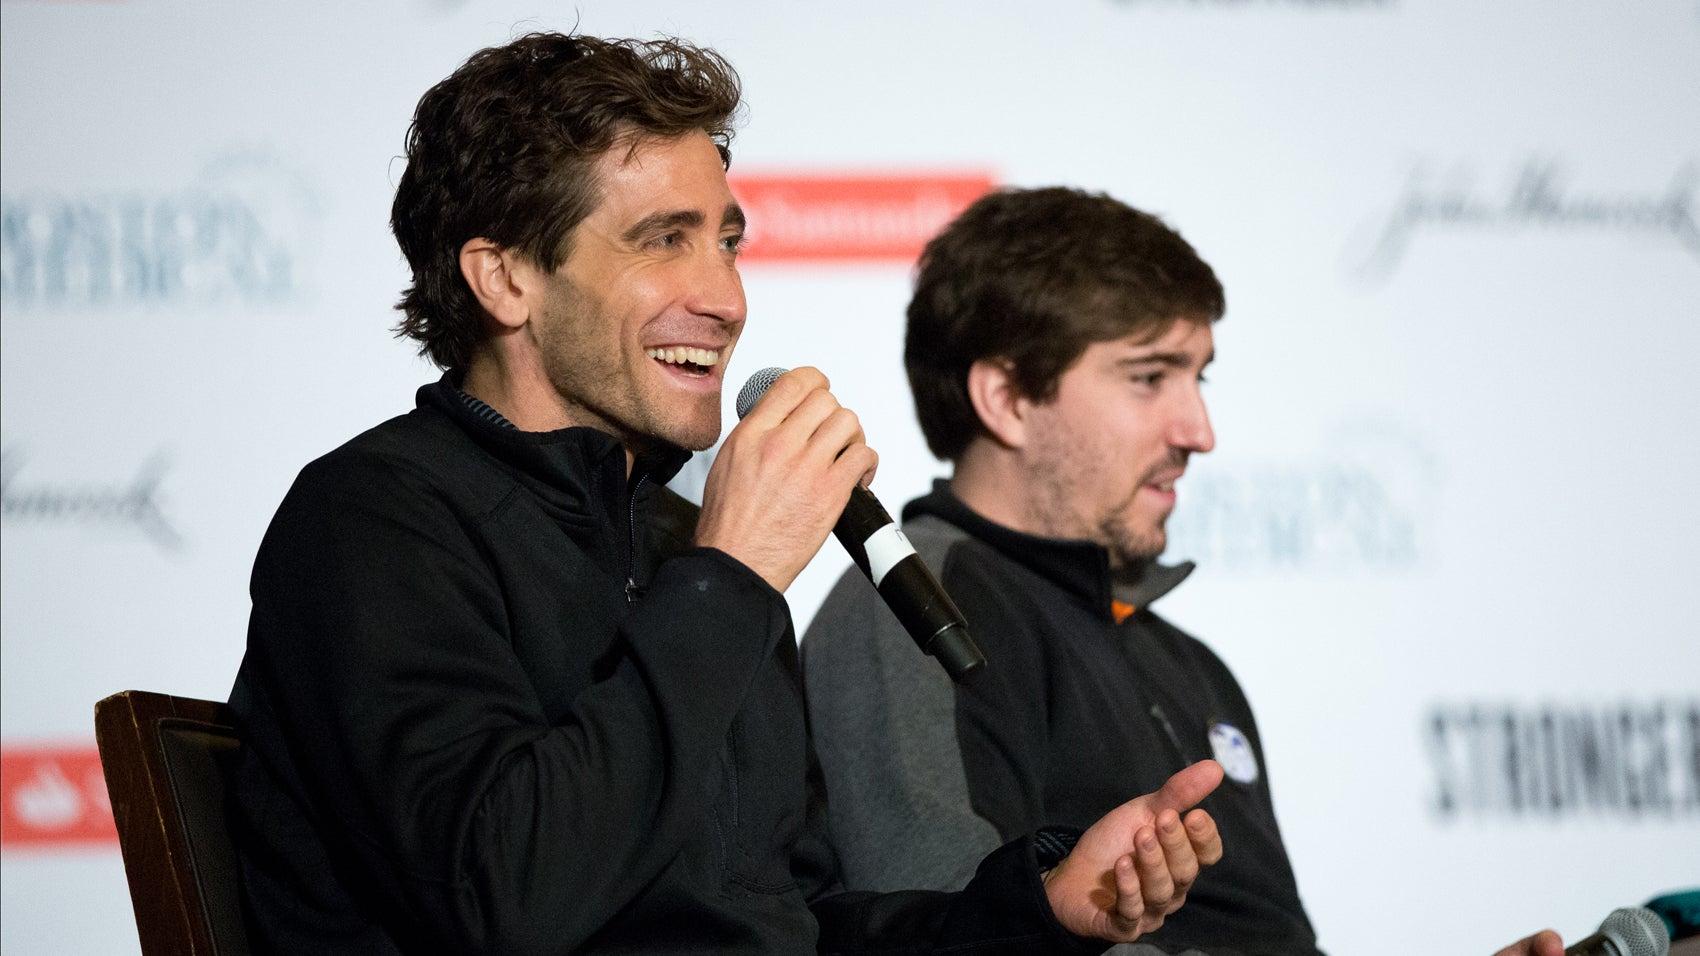 Gyllenhaal and Bauman speak on stage at the pasta dinner.